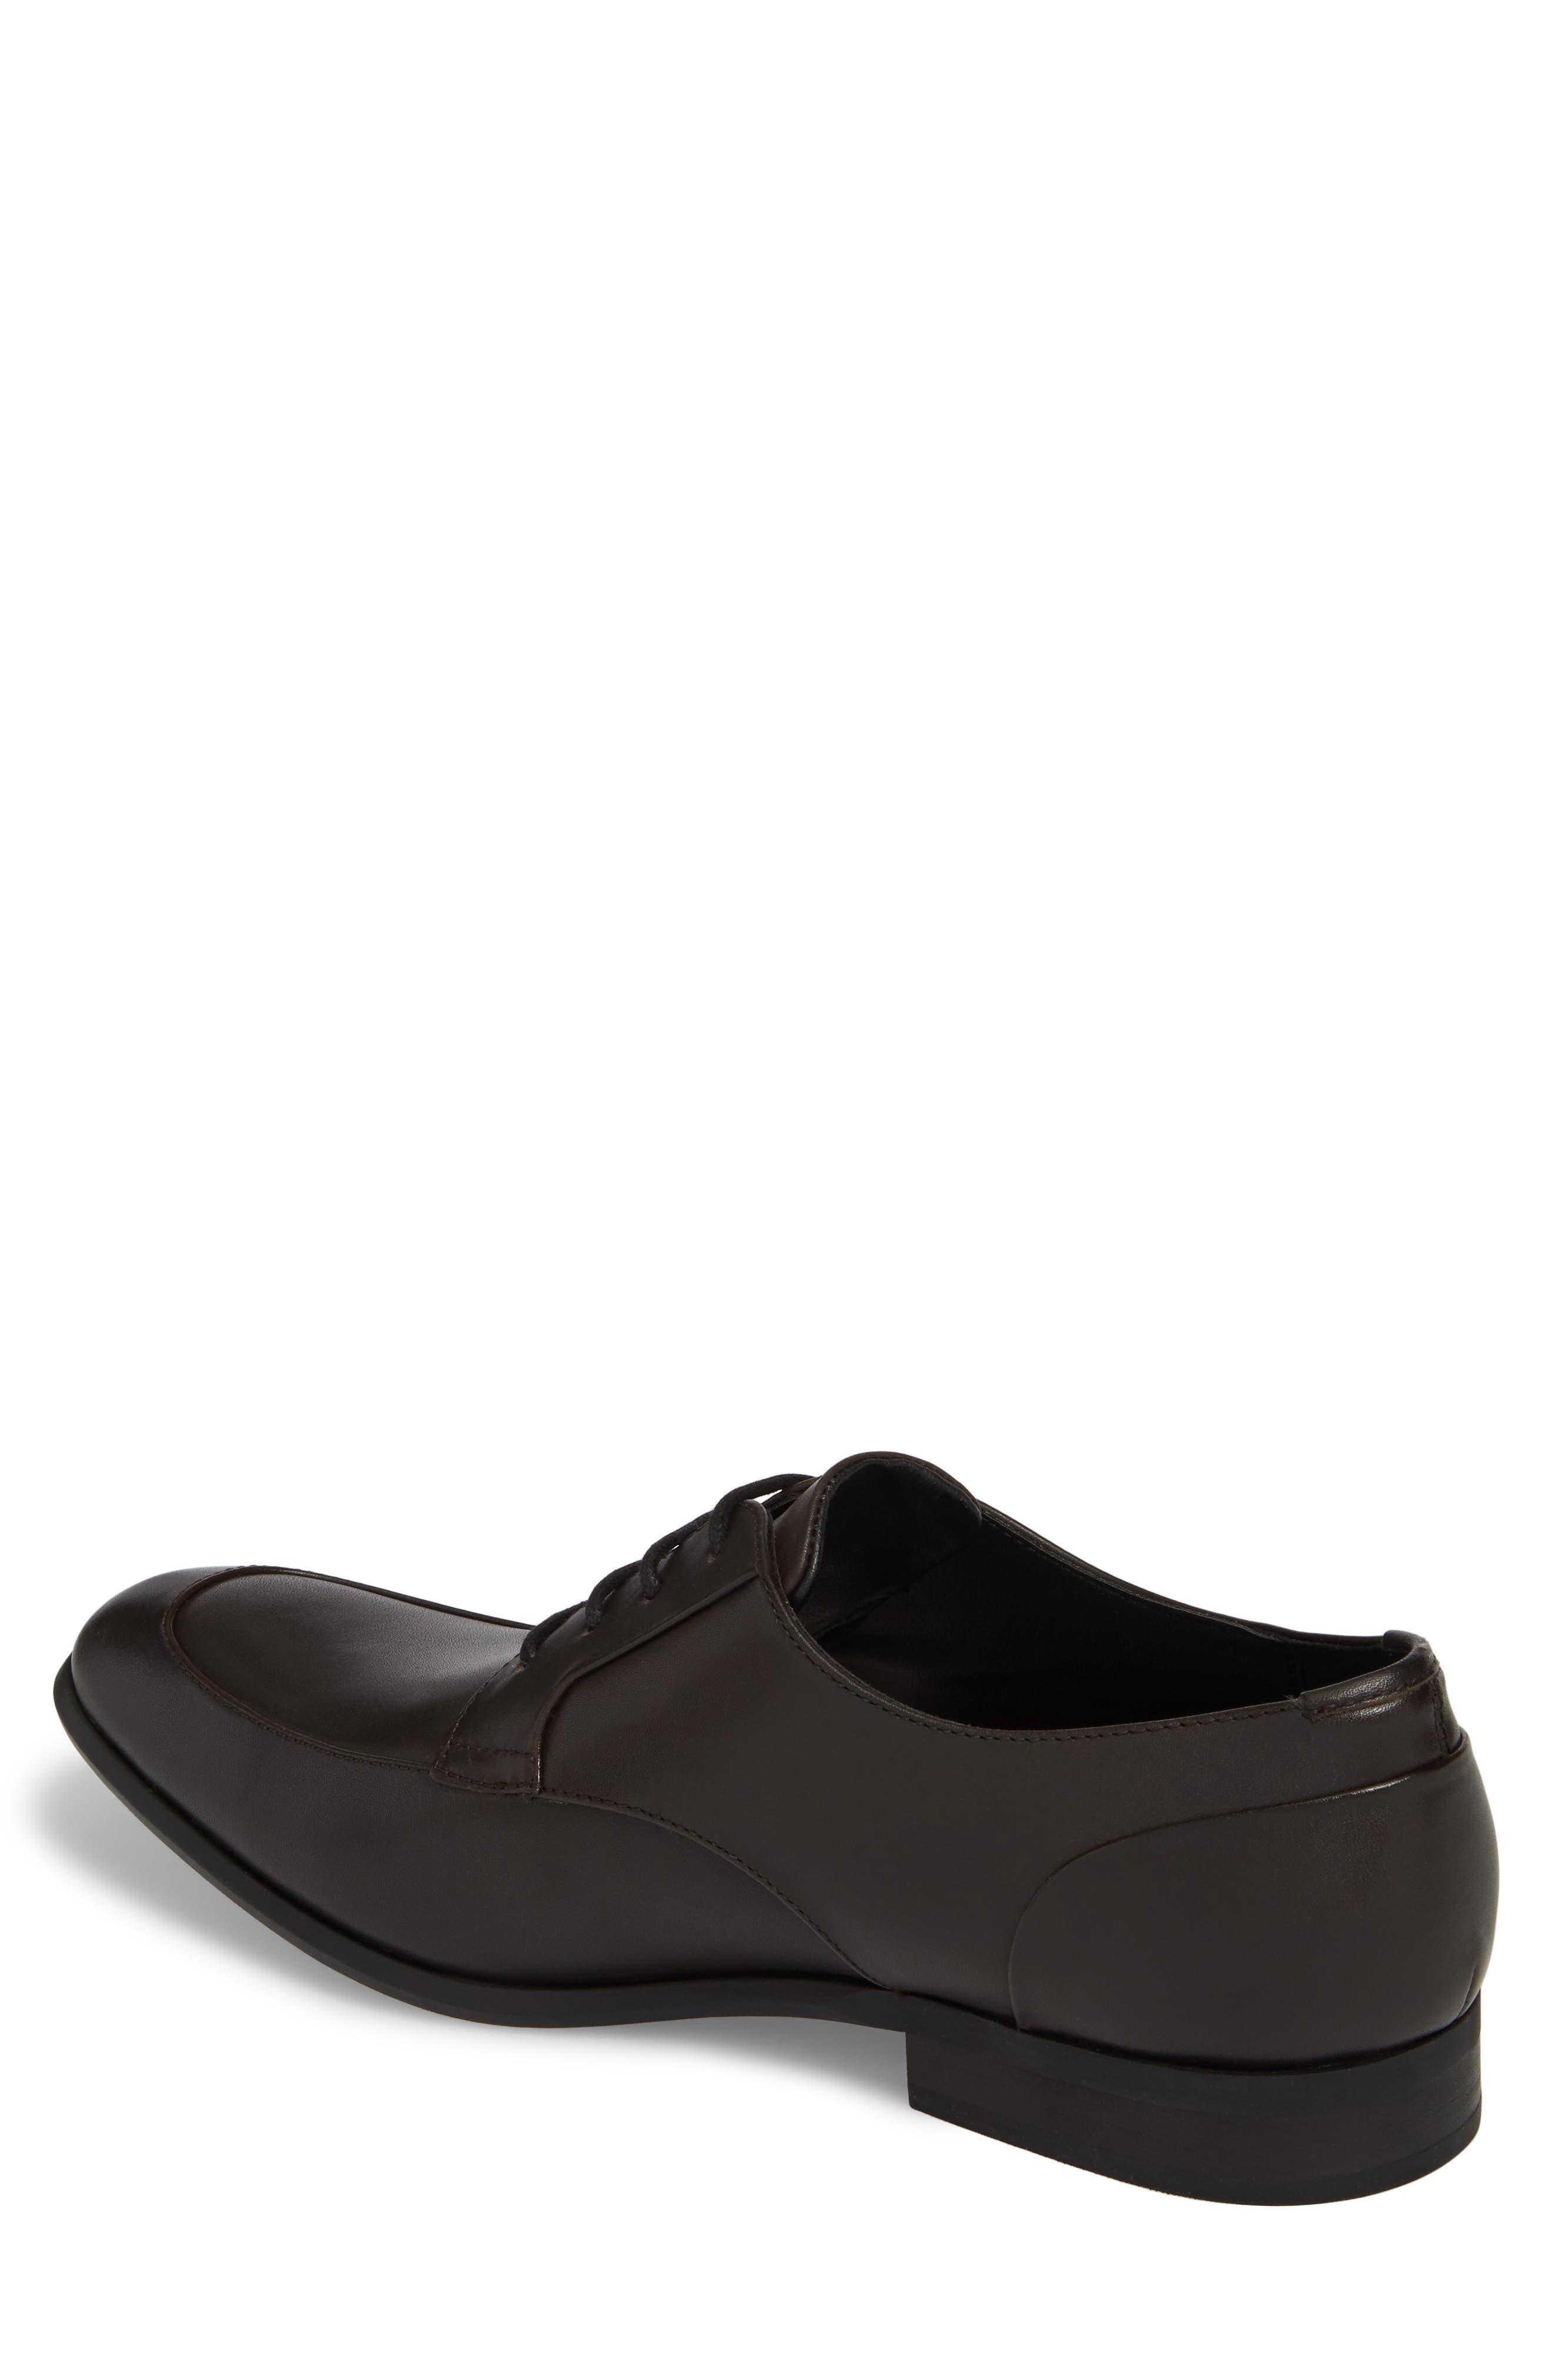 Lazarus Apron Toe Derby,                             Alternate thumbnail 2, color,                             Dark Brown Leather